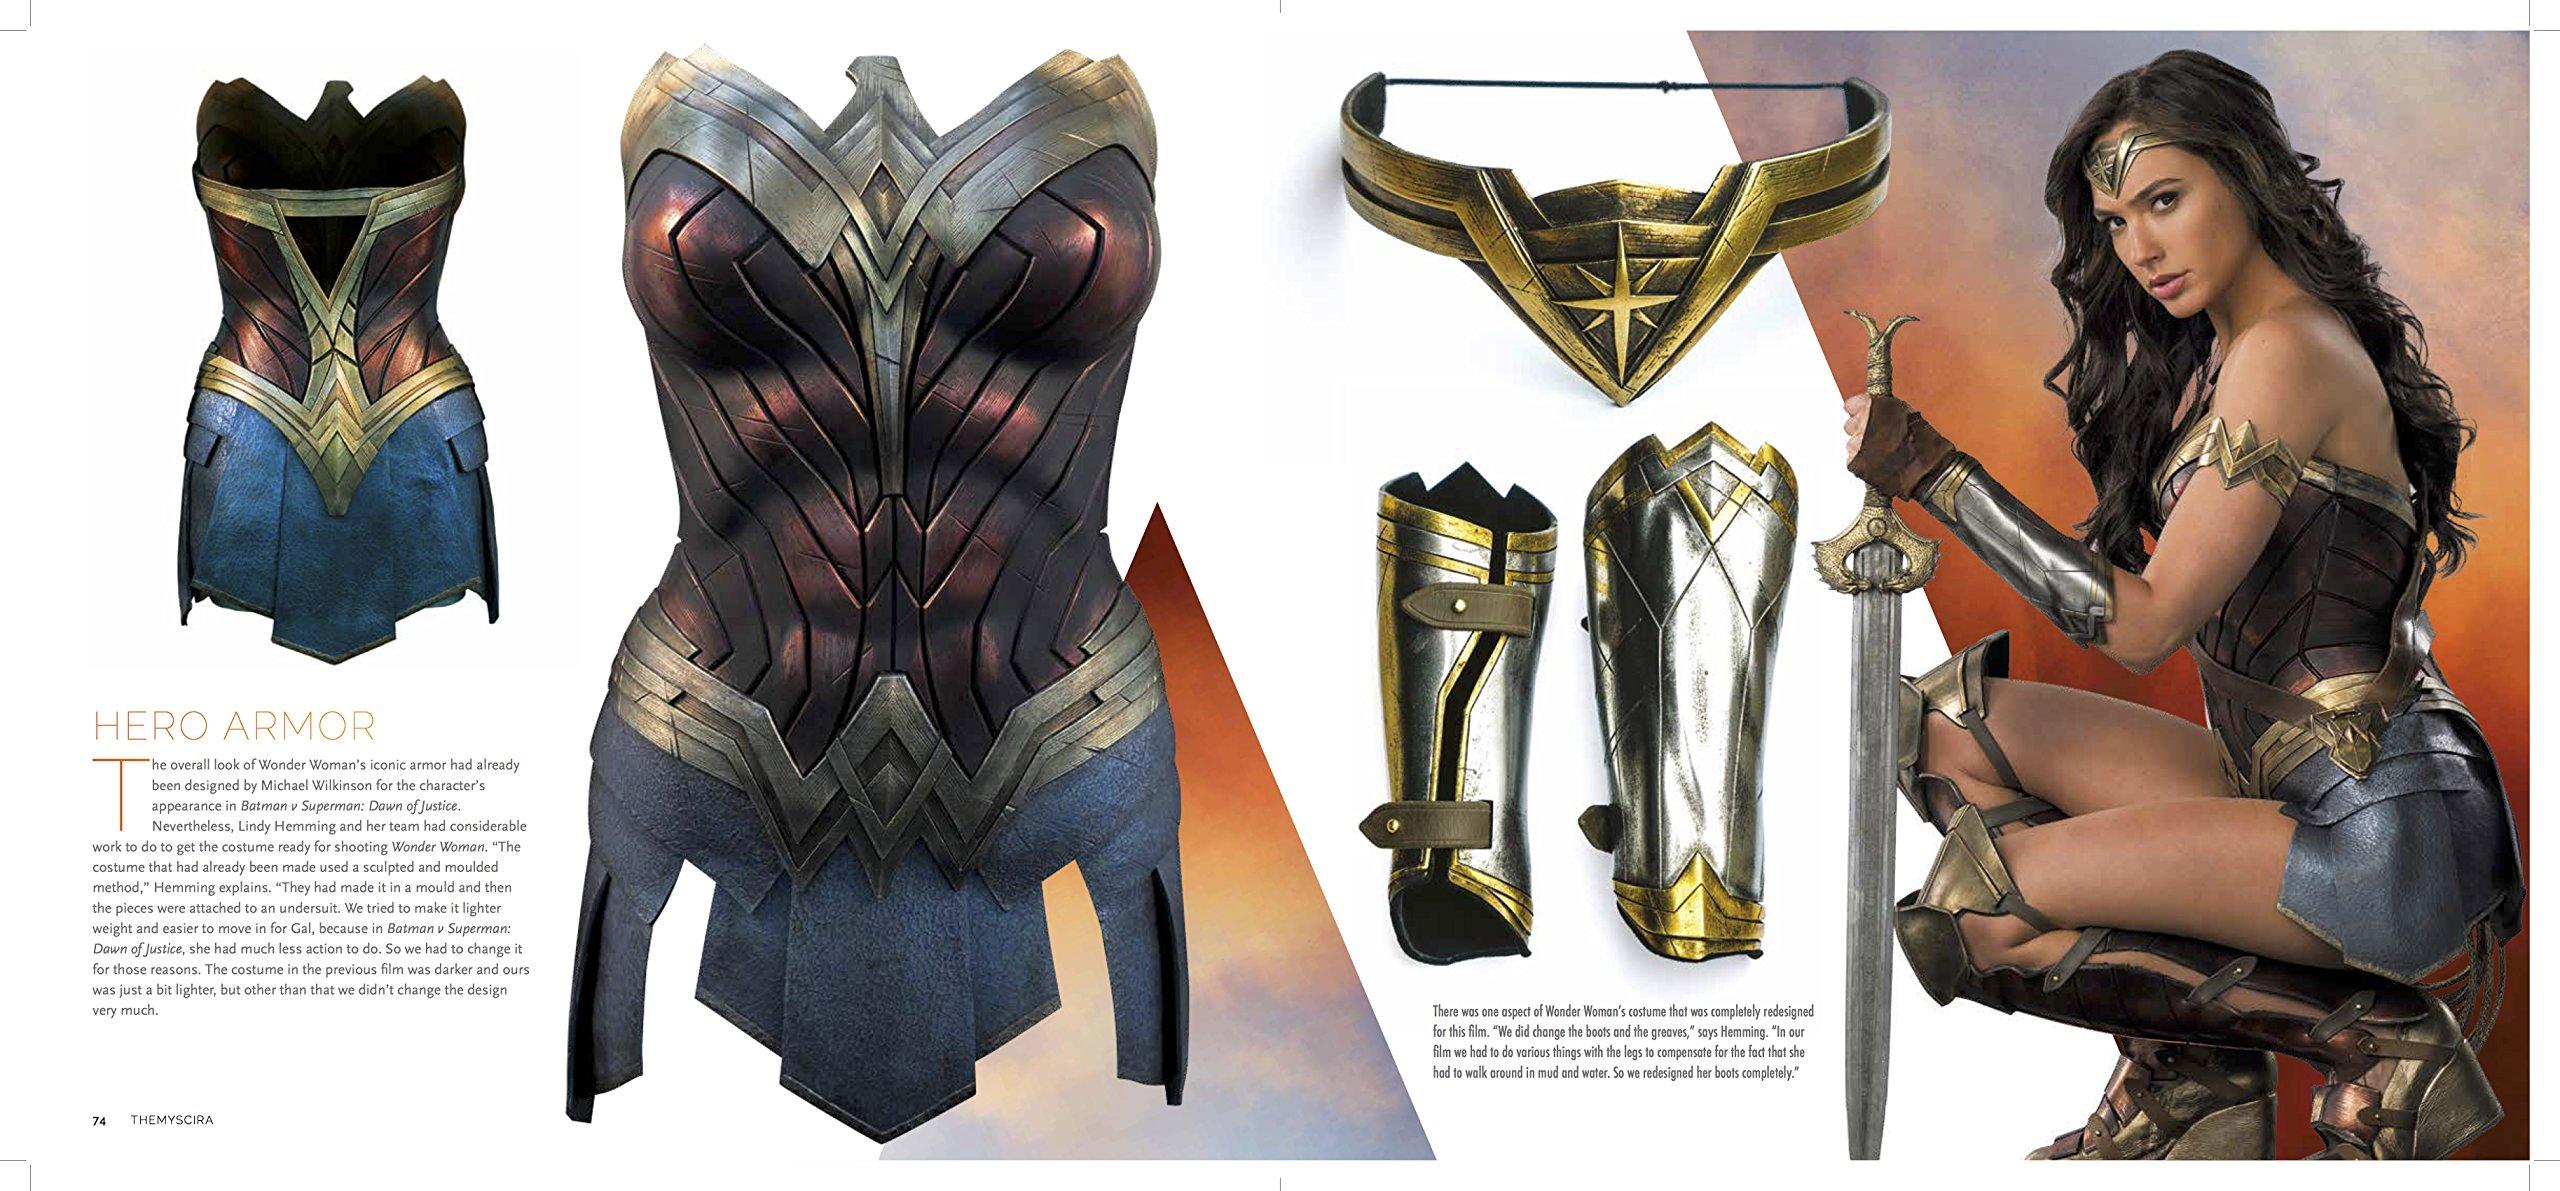 Wonder Woman The Art And Making Of The Film Gosling Sharon 9781785654626 Amazon Com Books